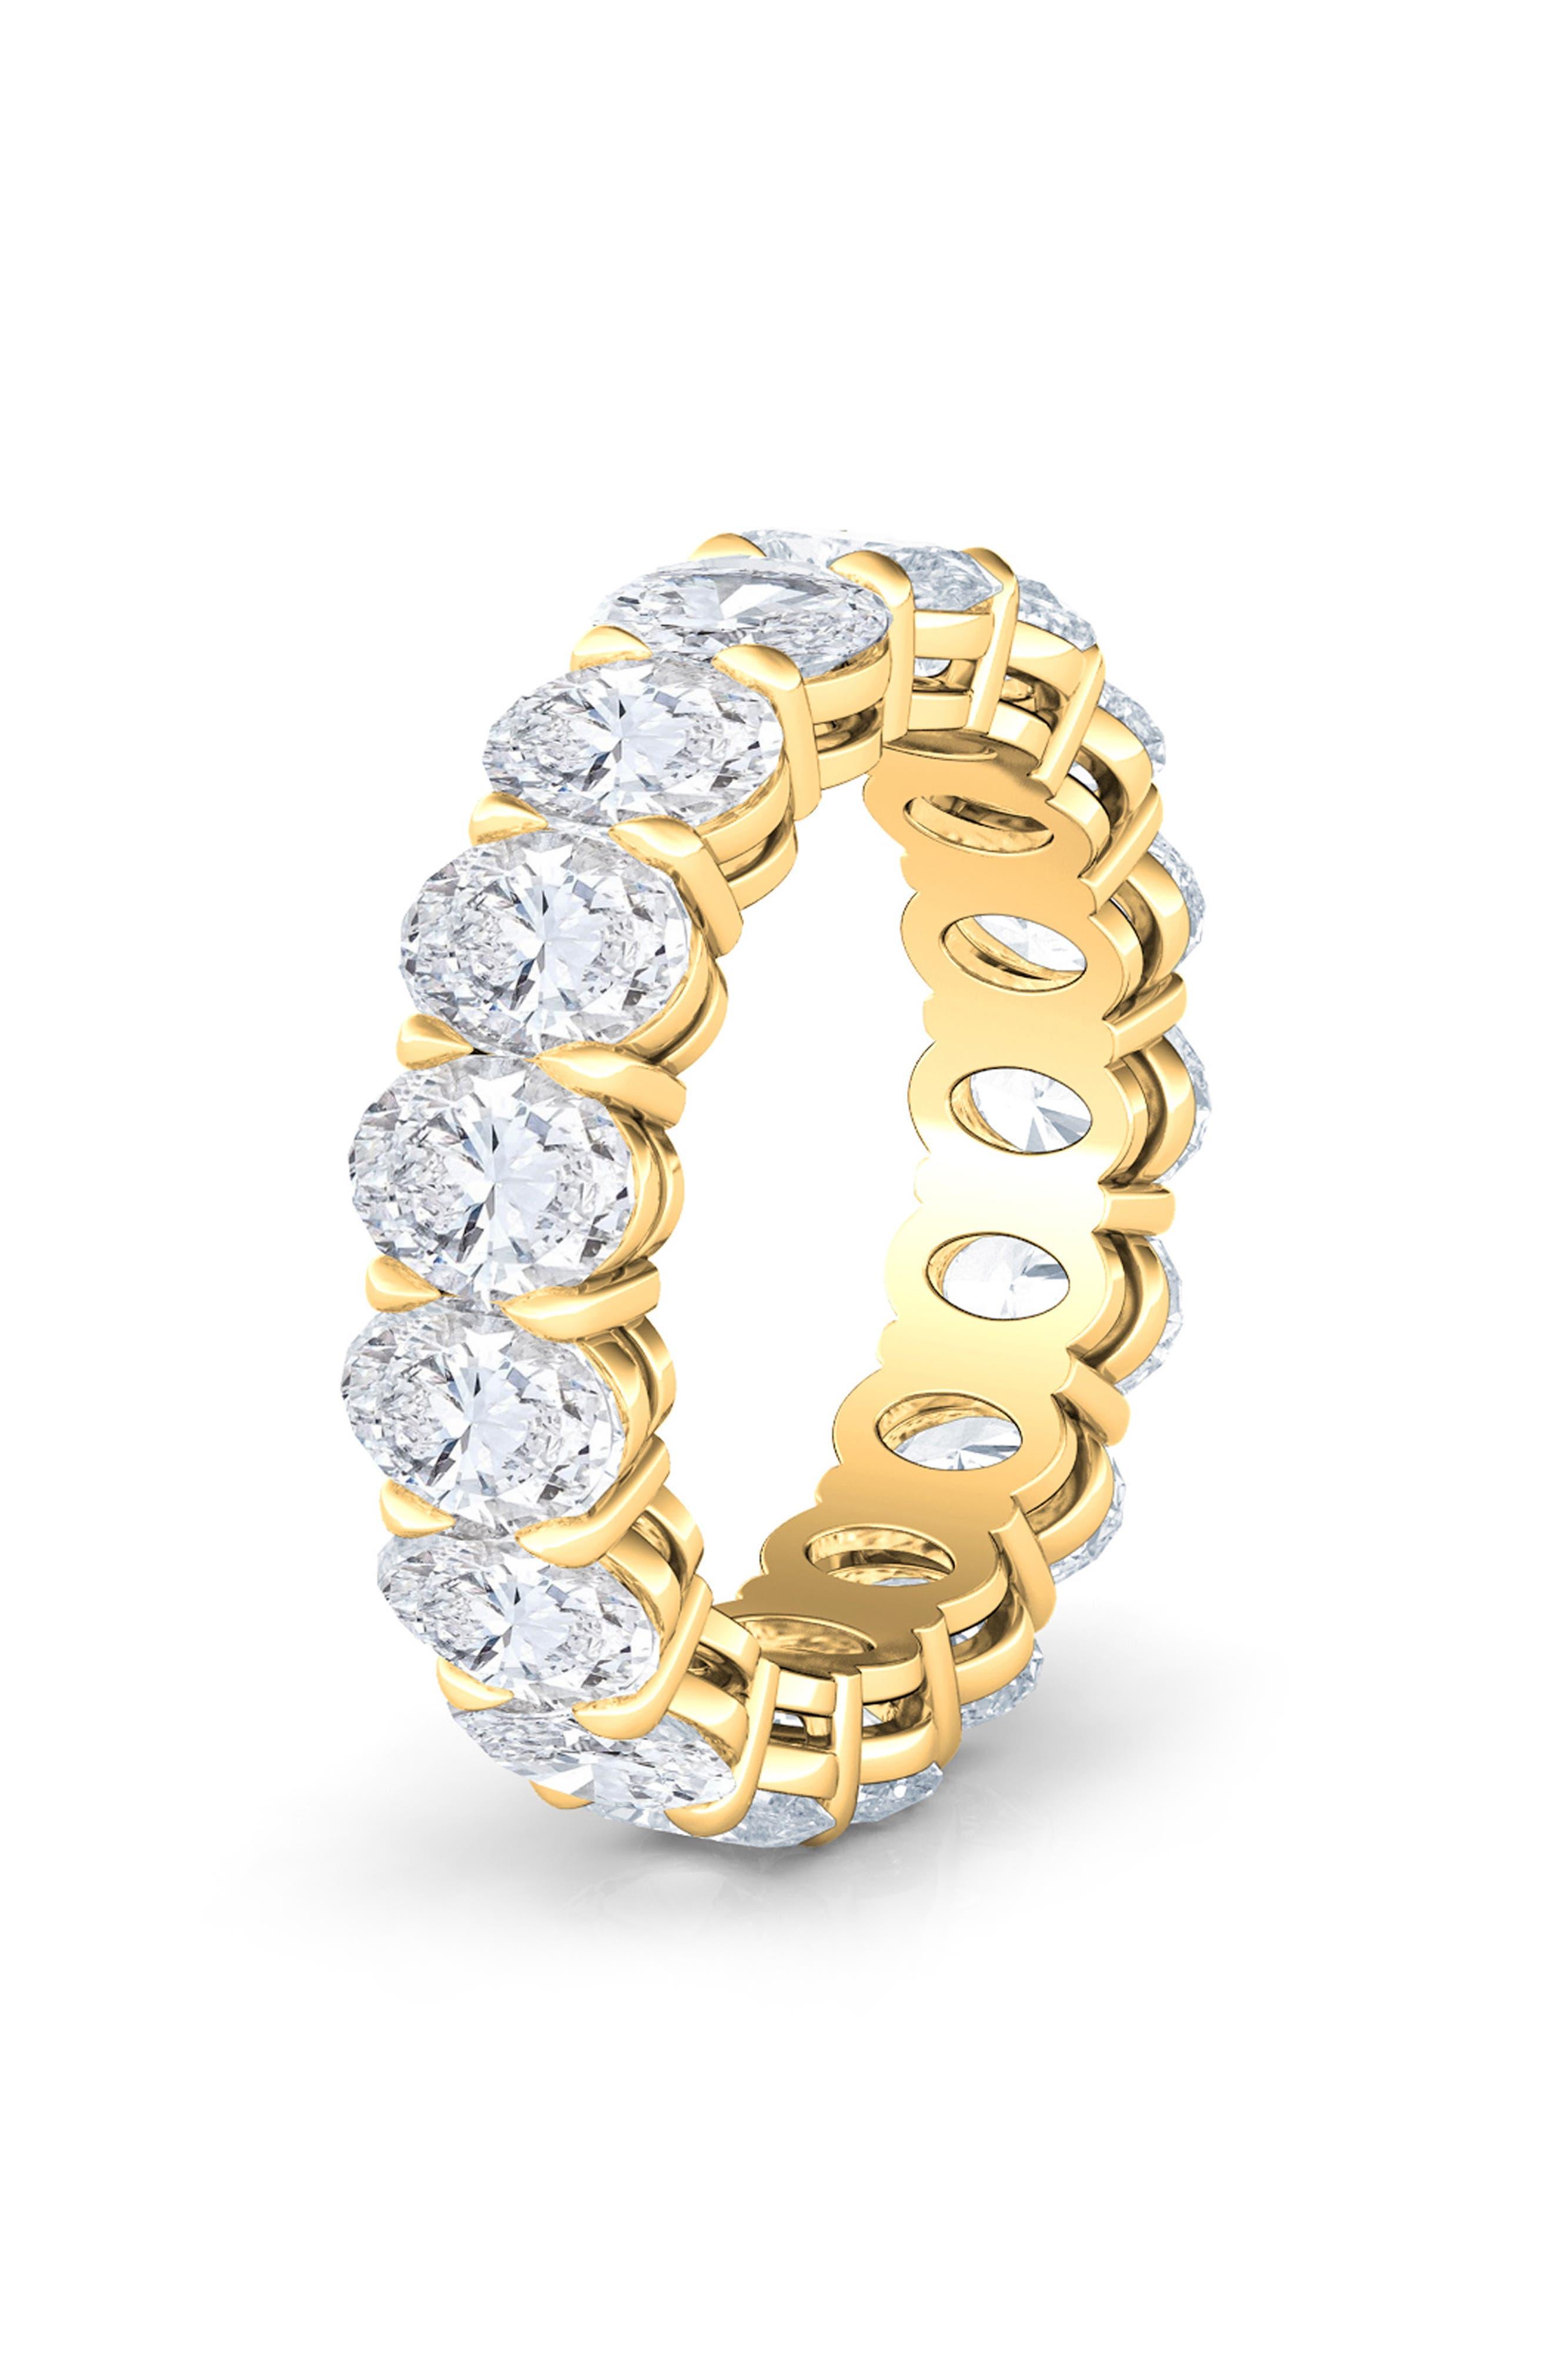 Oval Cut 4Ct Tw Lab Created Diamond 18K Gold Eternity Band